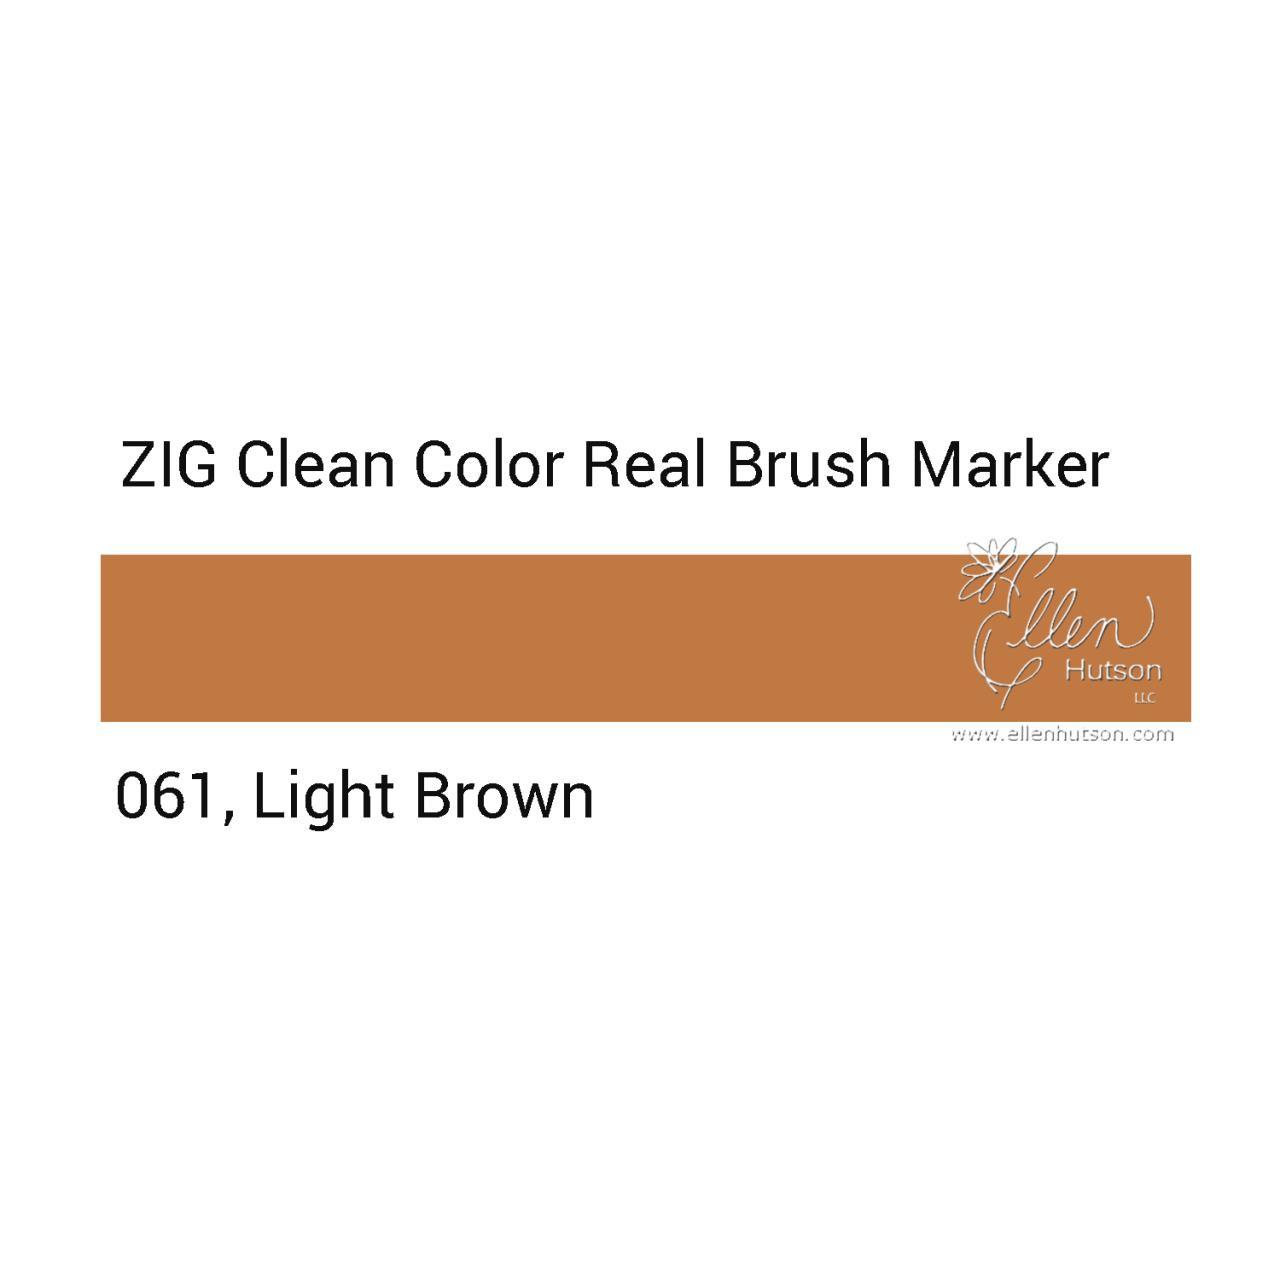 061 - Light Brown, ZIG Clean Color Real Brush Marker -